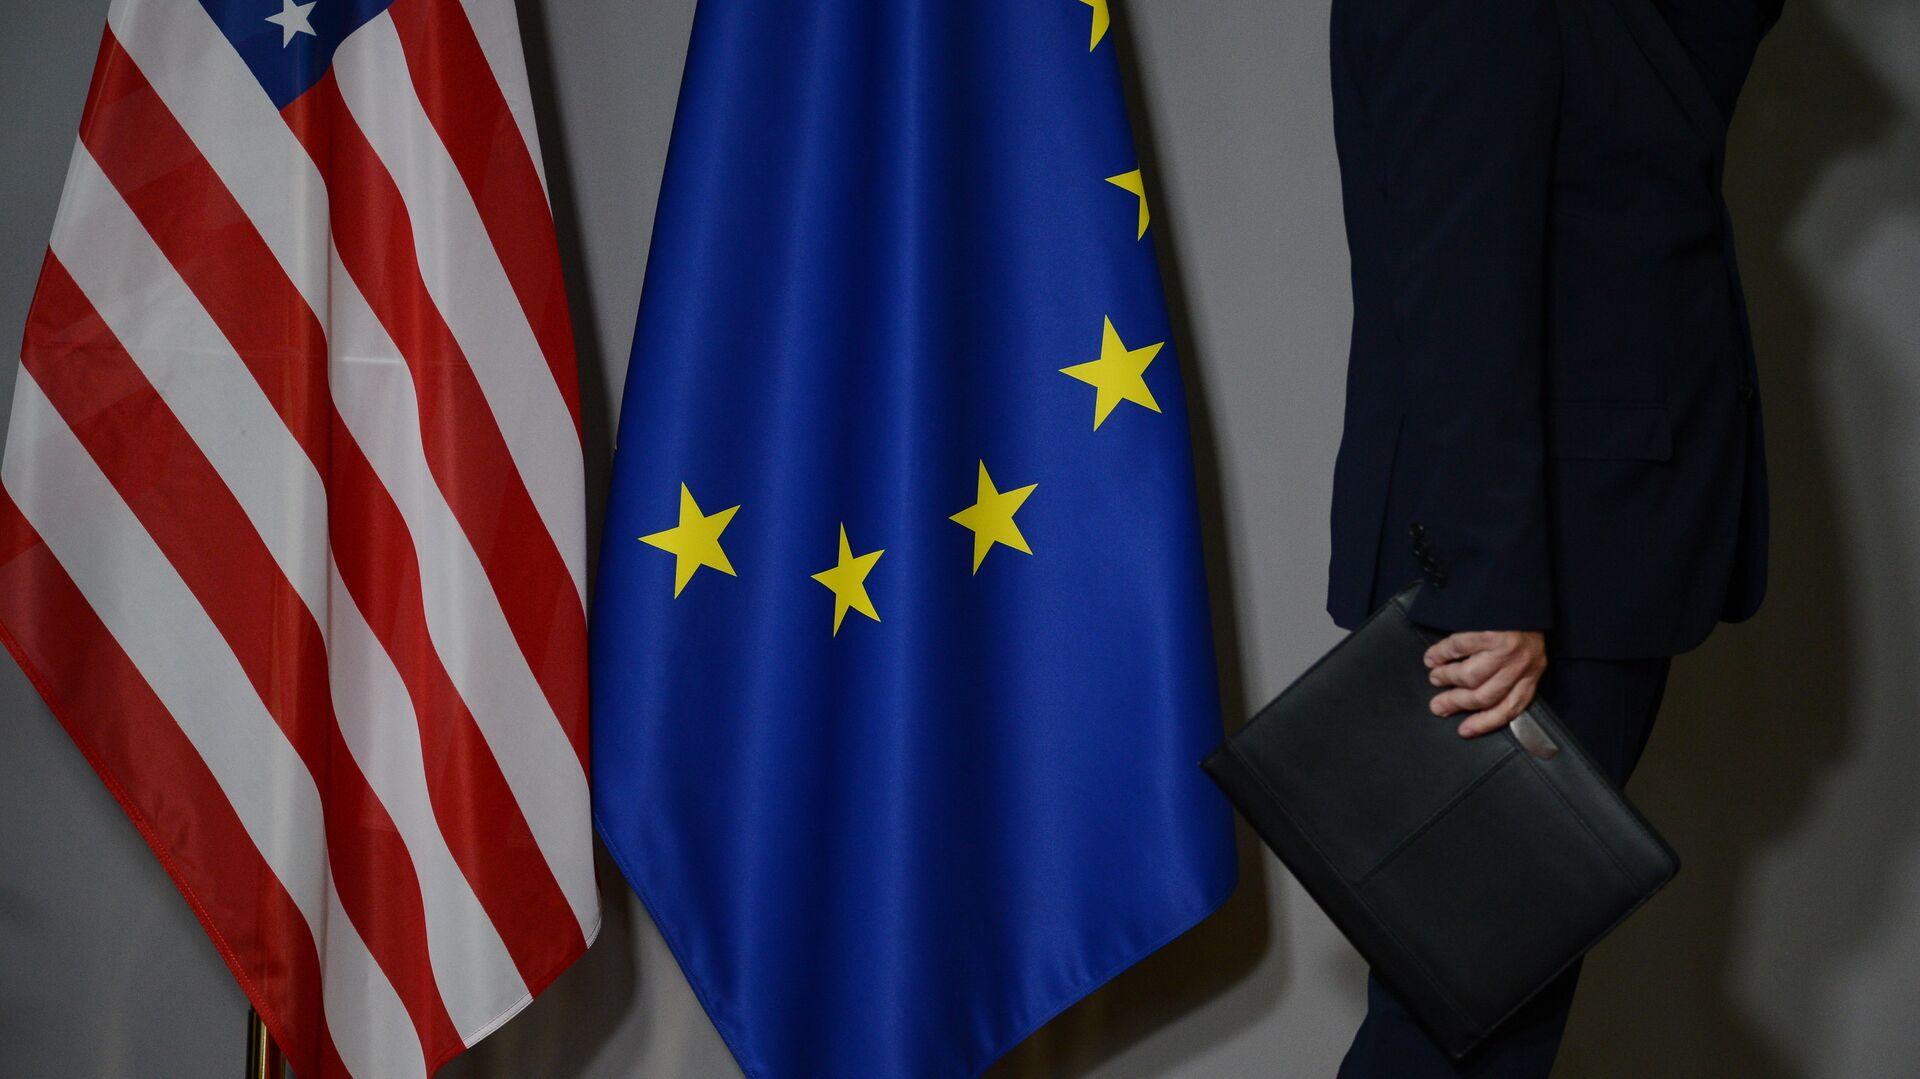 США и ЕС давно не сотрудничают в экономике, заявила экс-глава МИД Австрии